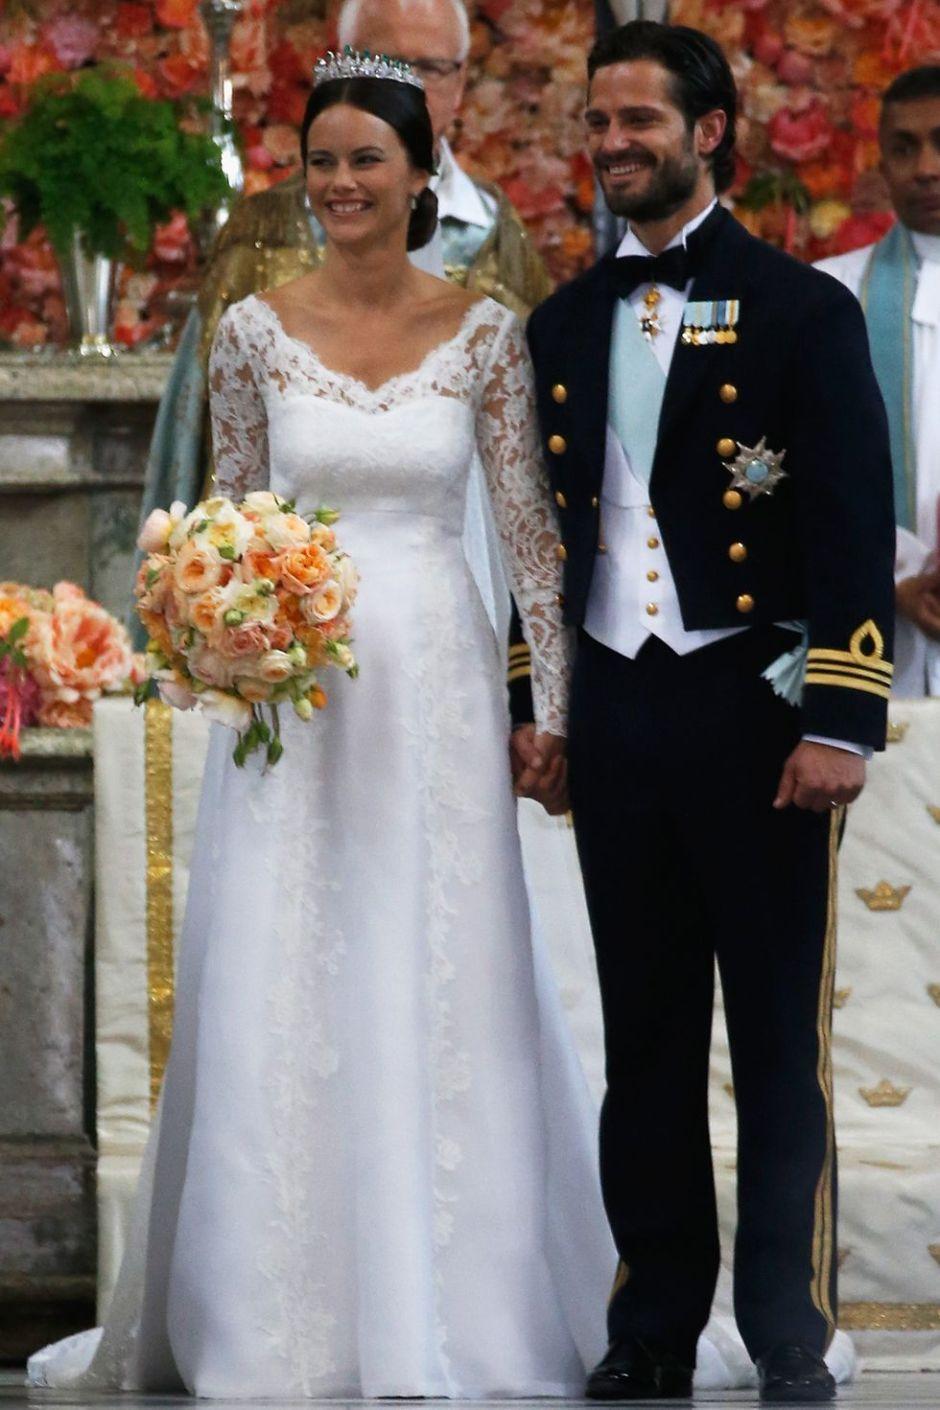 prince-carl-philip-and-princess-sofia-of-sweden-wedding-dress-1516608528